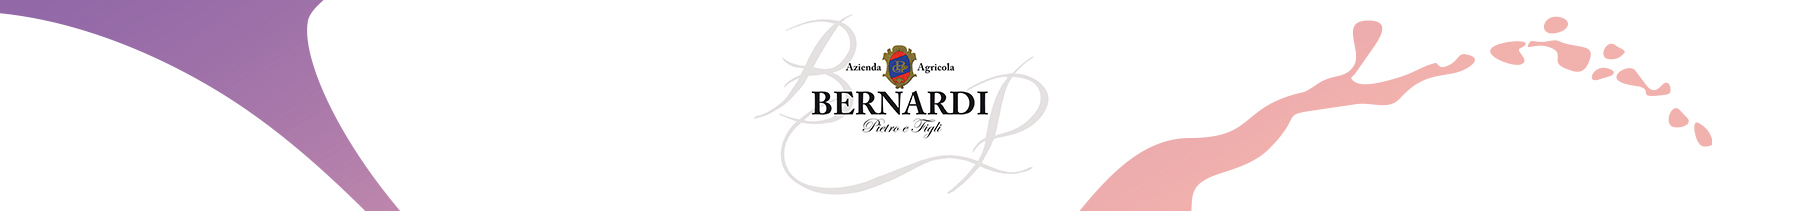 Bernardi Pietro & Figli